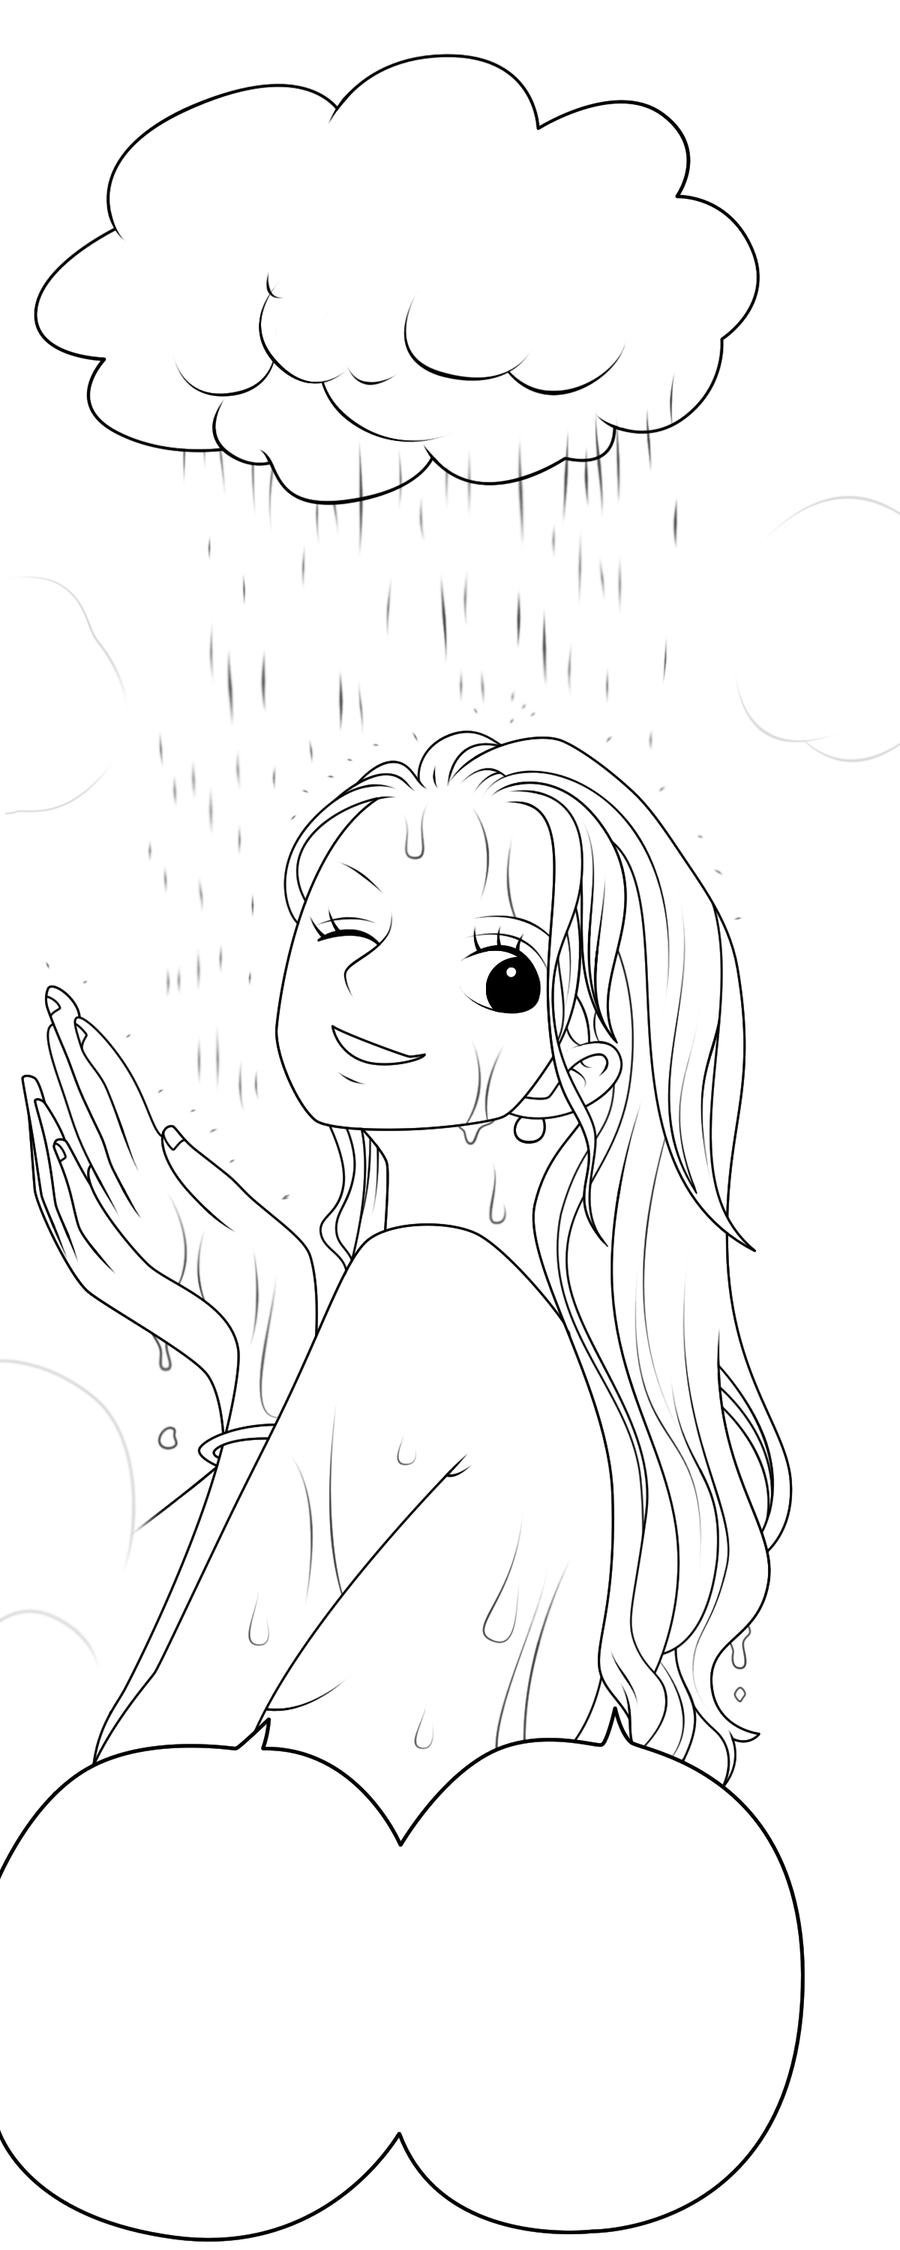 One Piece Lineart : One piece lineart by vaikingu on deviantart